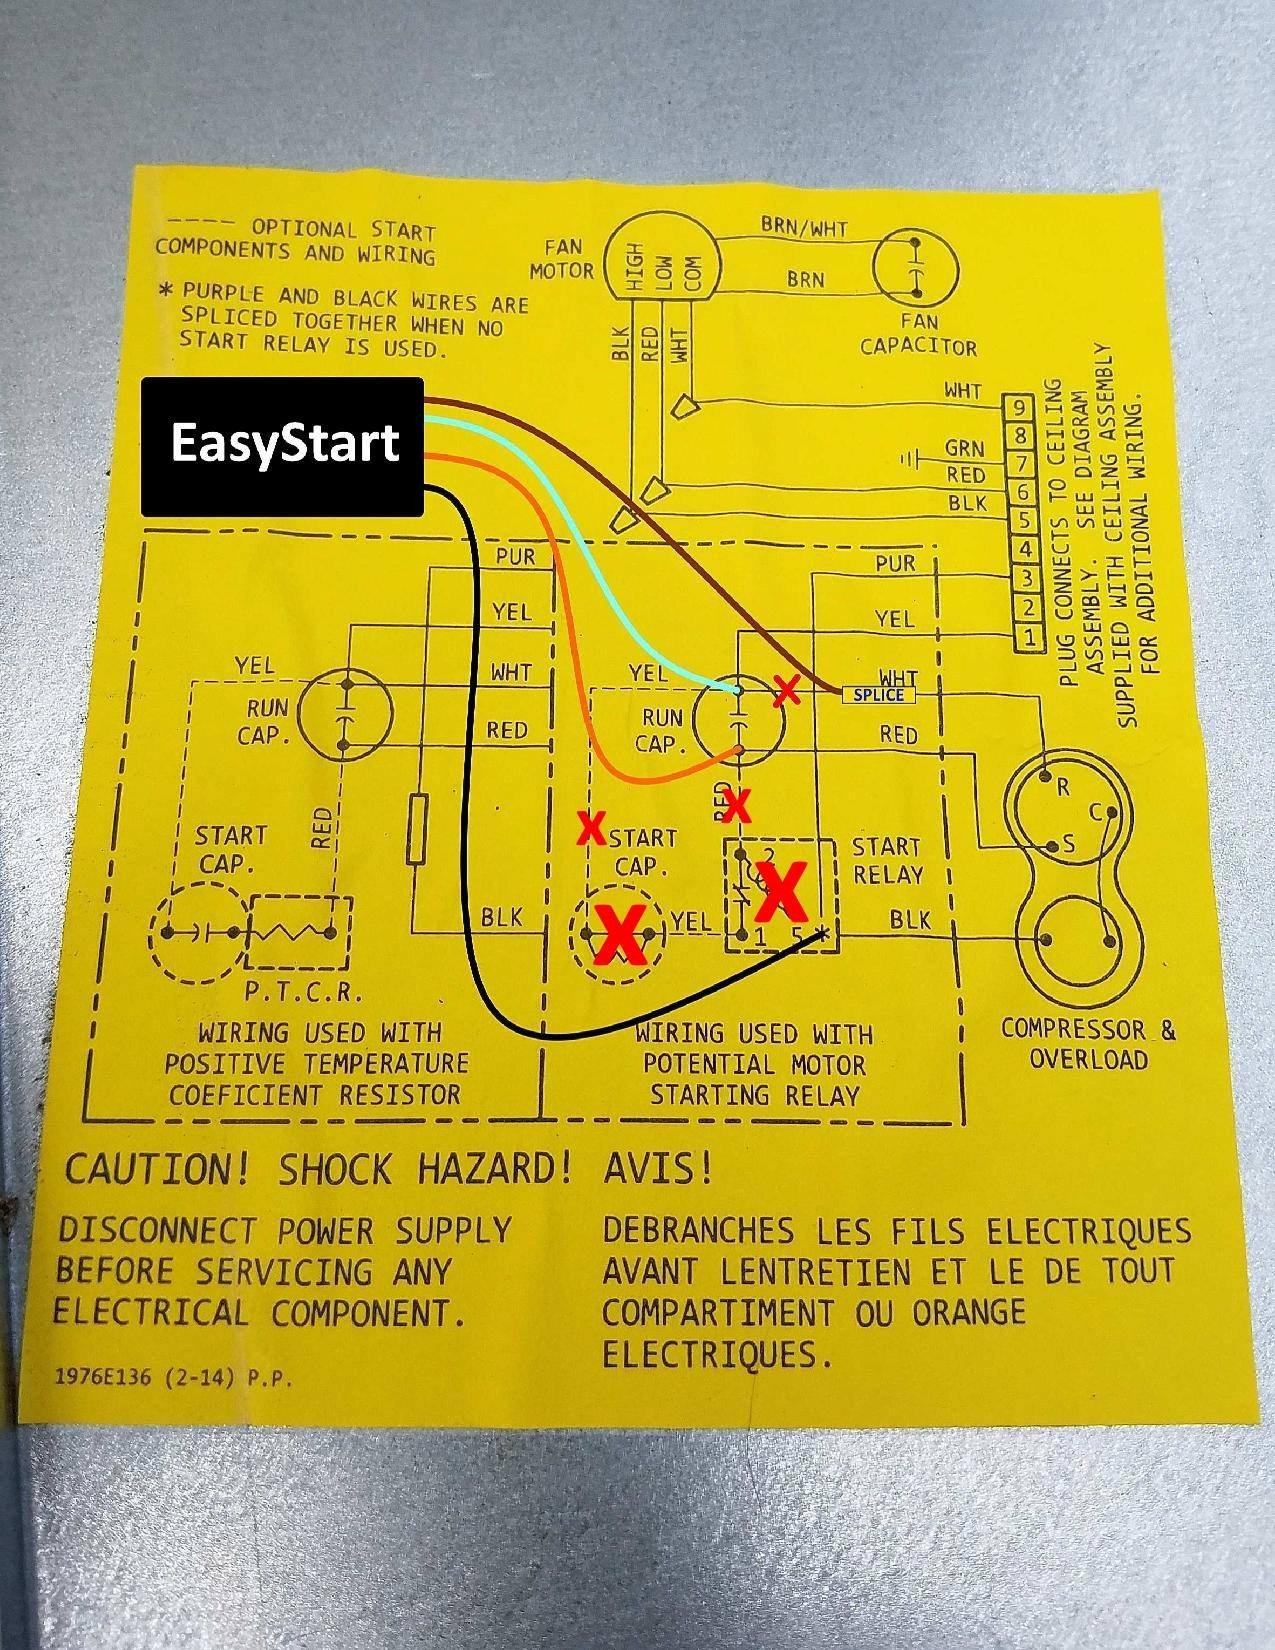 soft starter wiring diagram subaru forester rear suspension rv easystart diagrams resource page micro air coleman mach 1 364